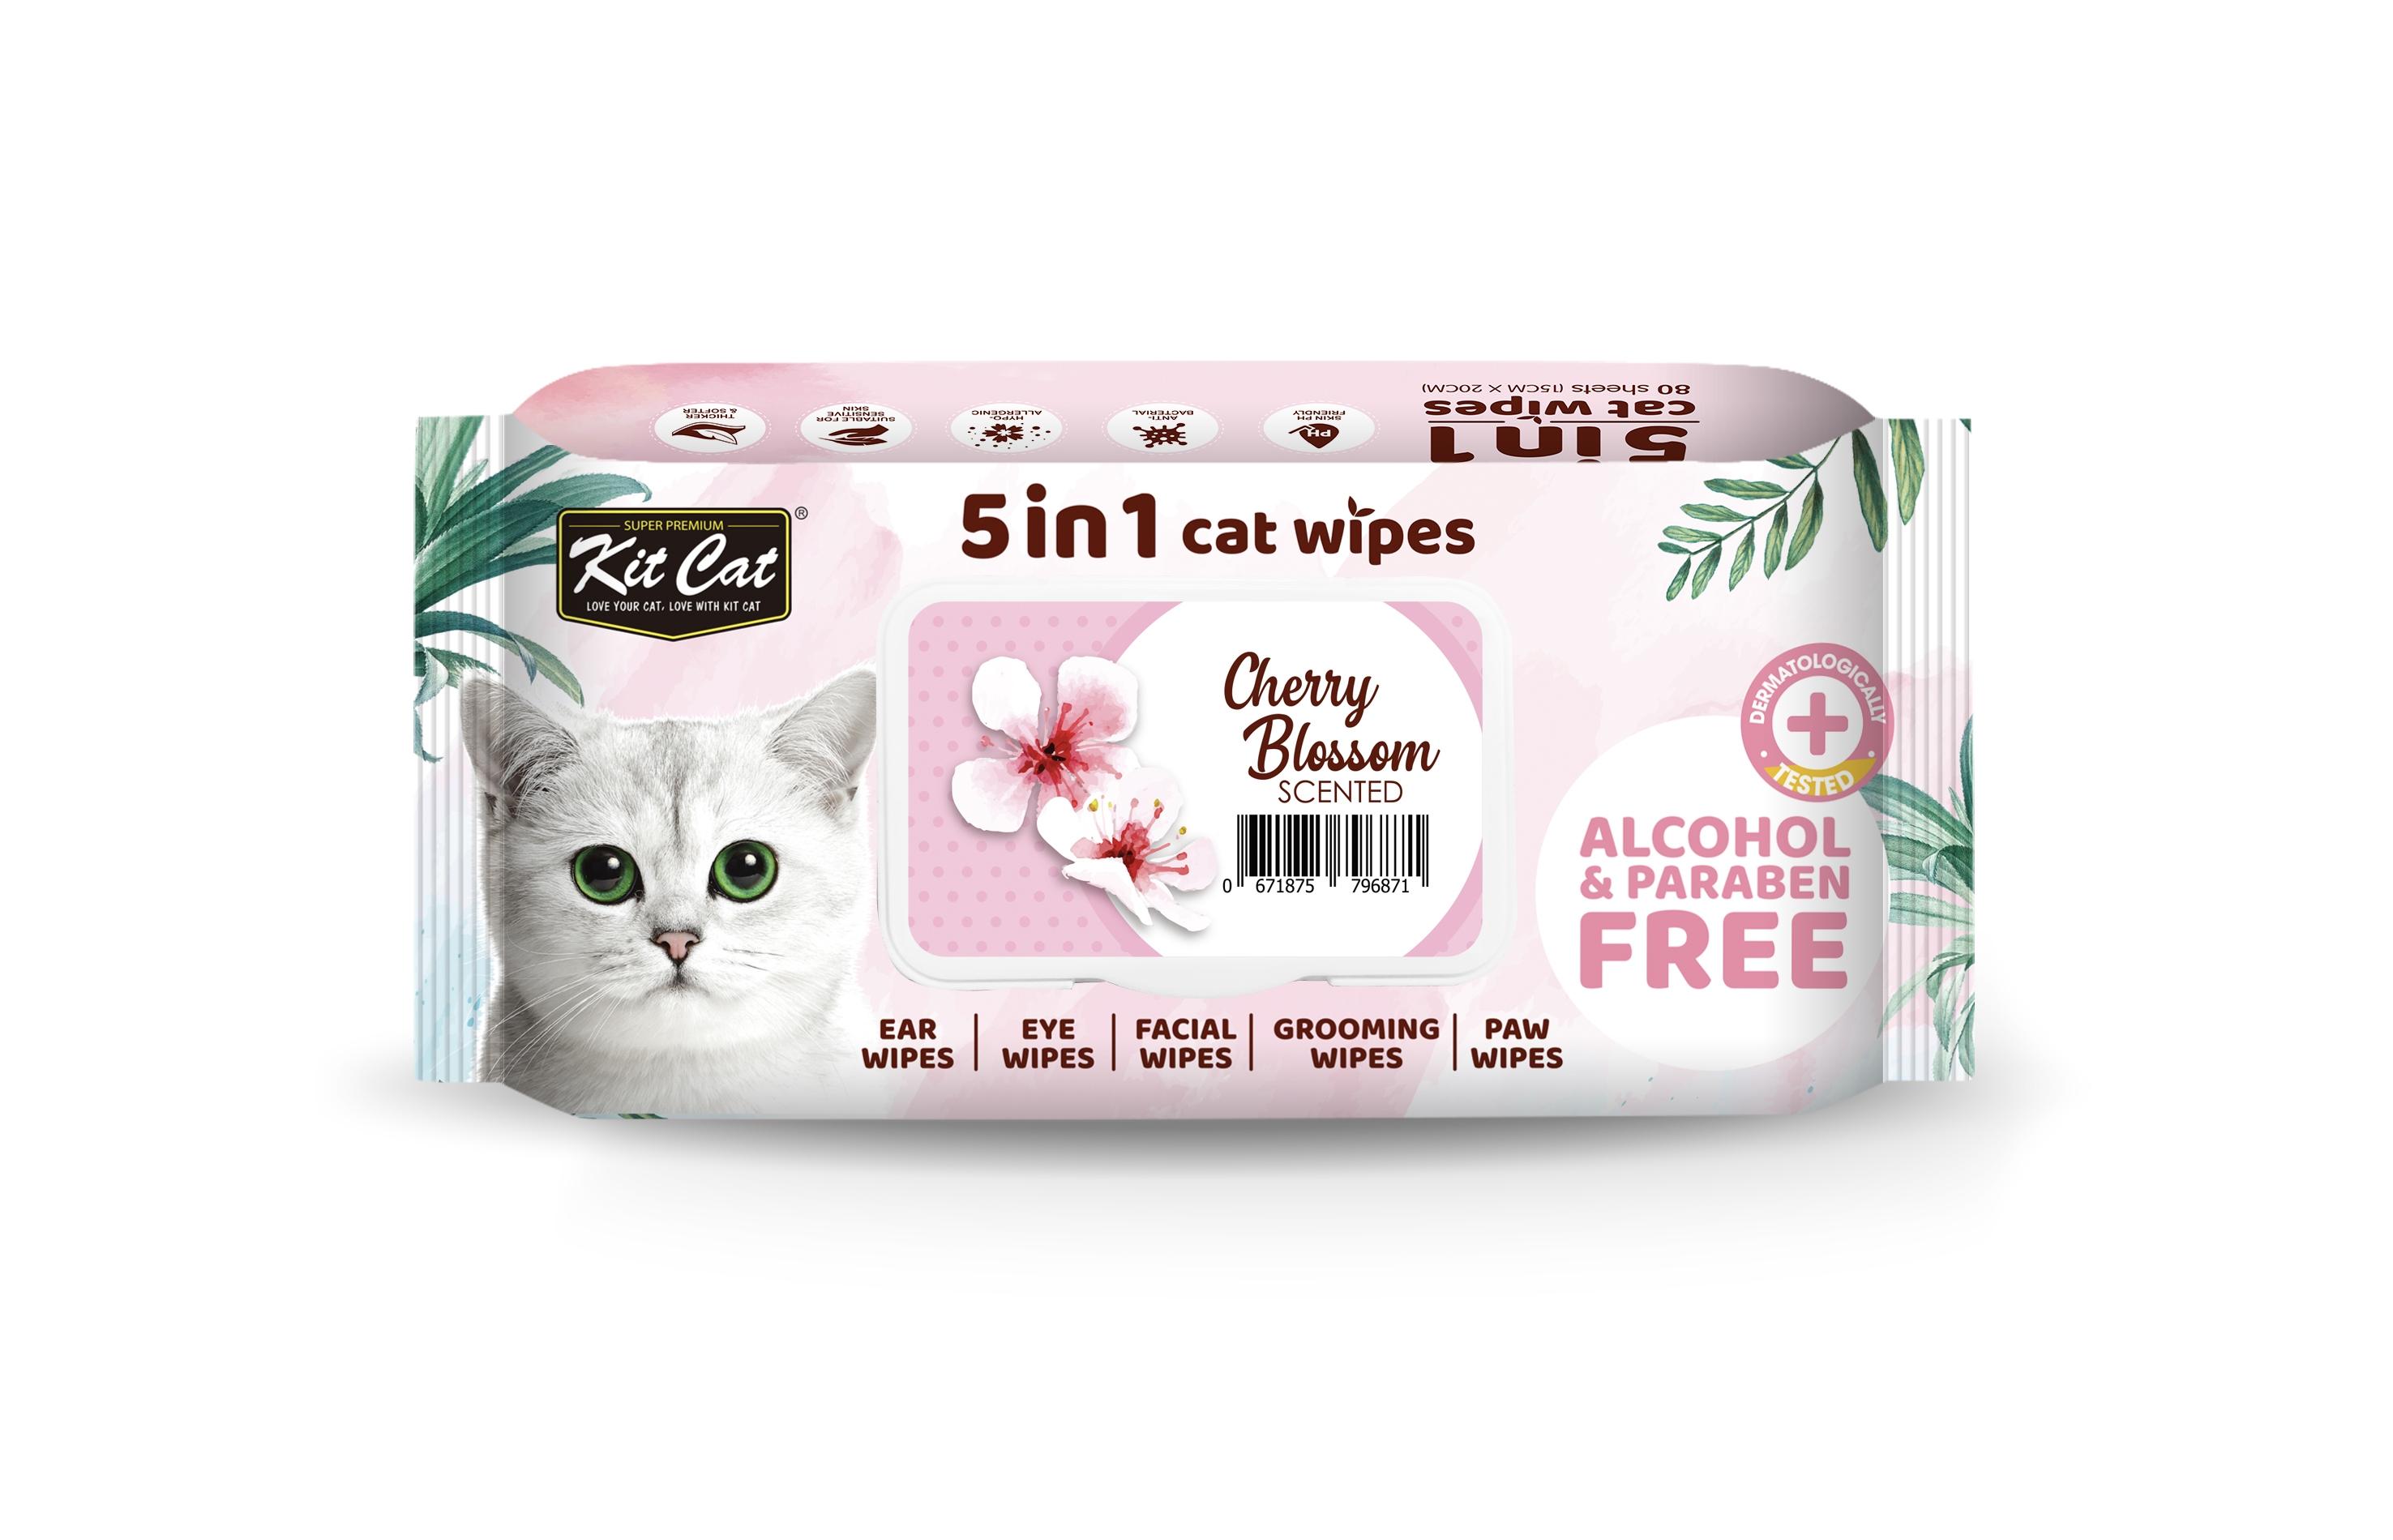 Servetele umede pentru pisici, Kit Cat 5in1 Cherry Blossom, 80 buc imagine